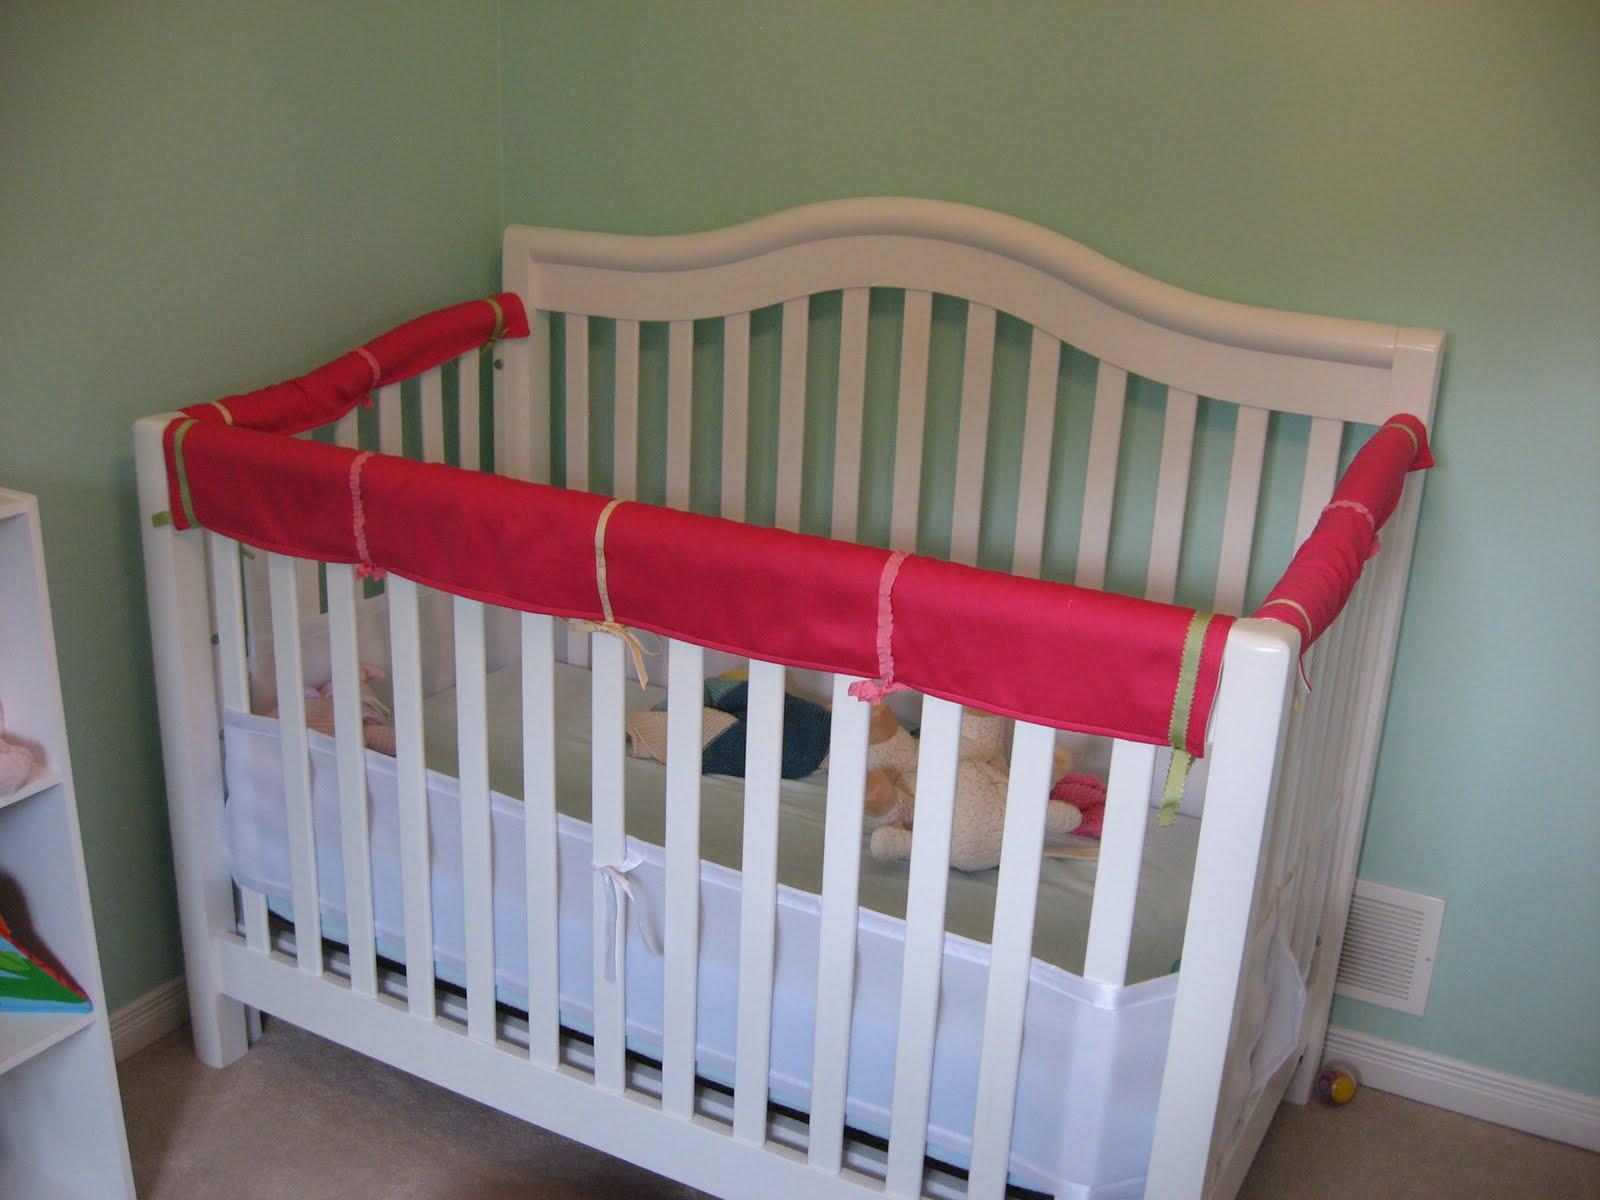 Silly Daisy Designs Don T Chew That Crib Rail Cover A